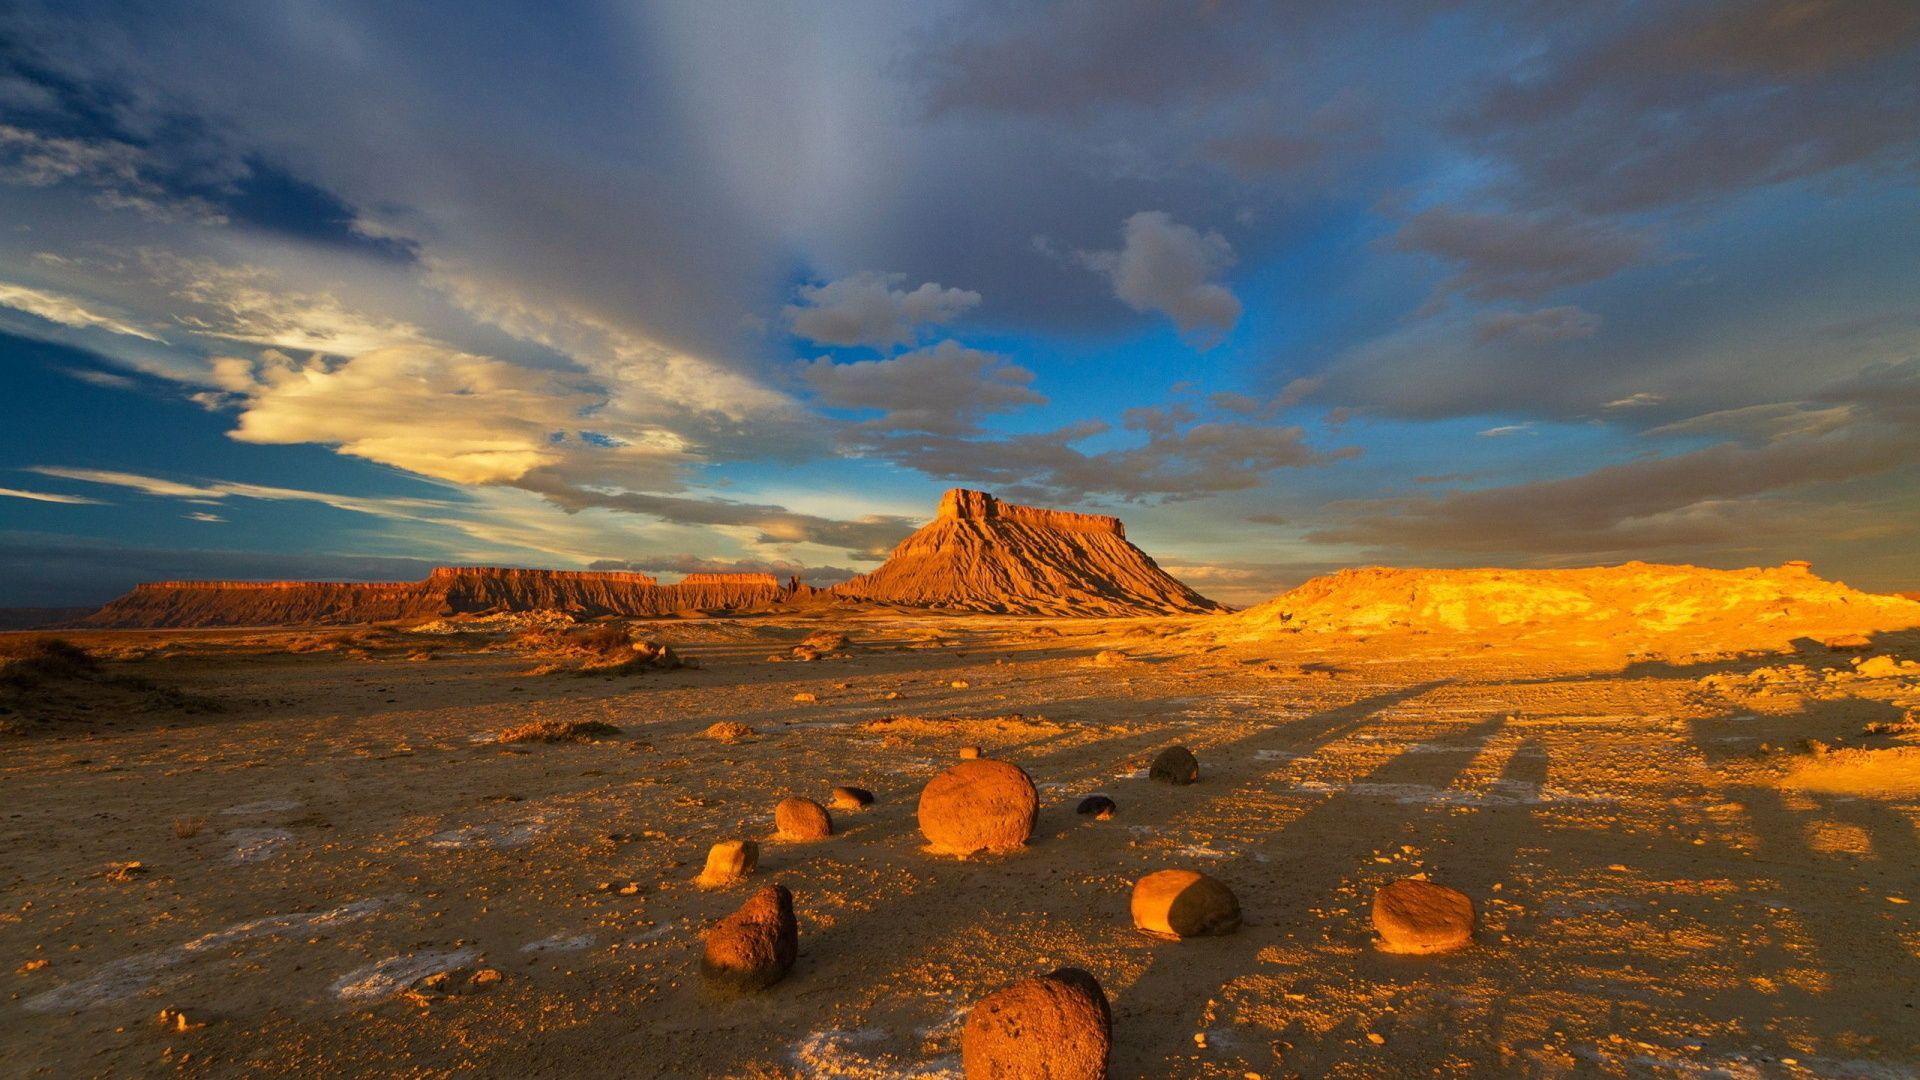 Desert Foothills Landscape wallpaper